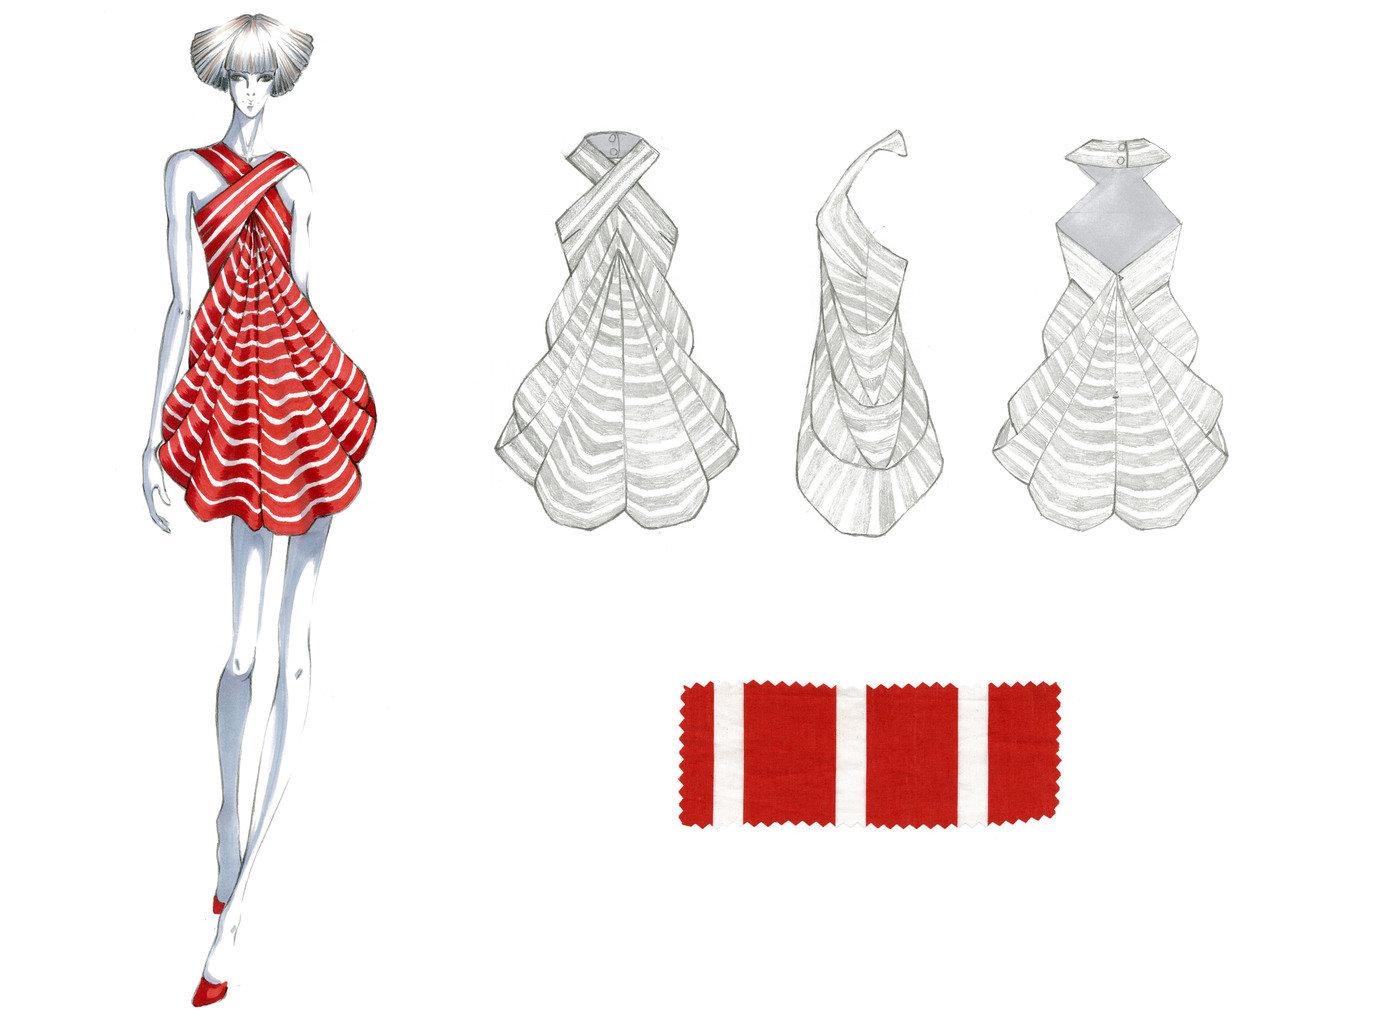 Stripe Drape Dress Project By Zhe Hou At Coroflot Com